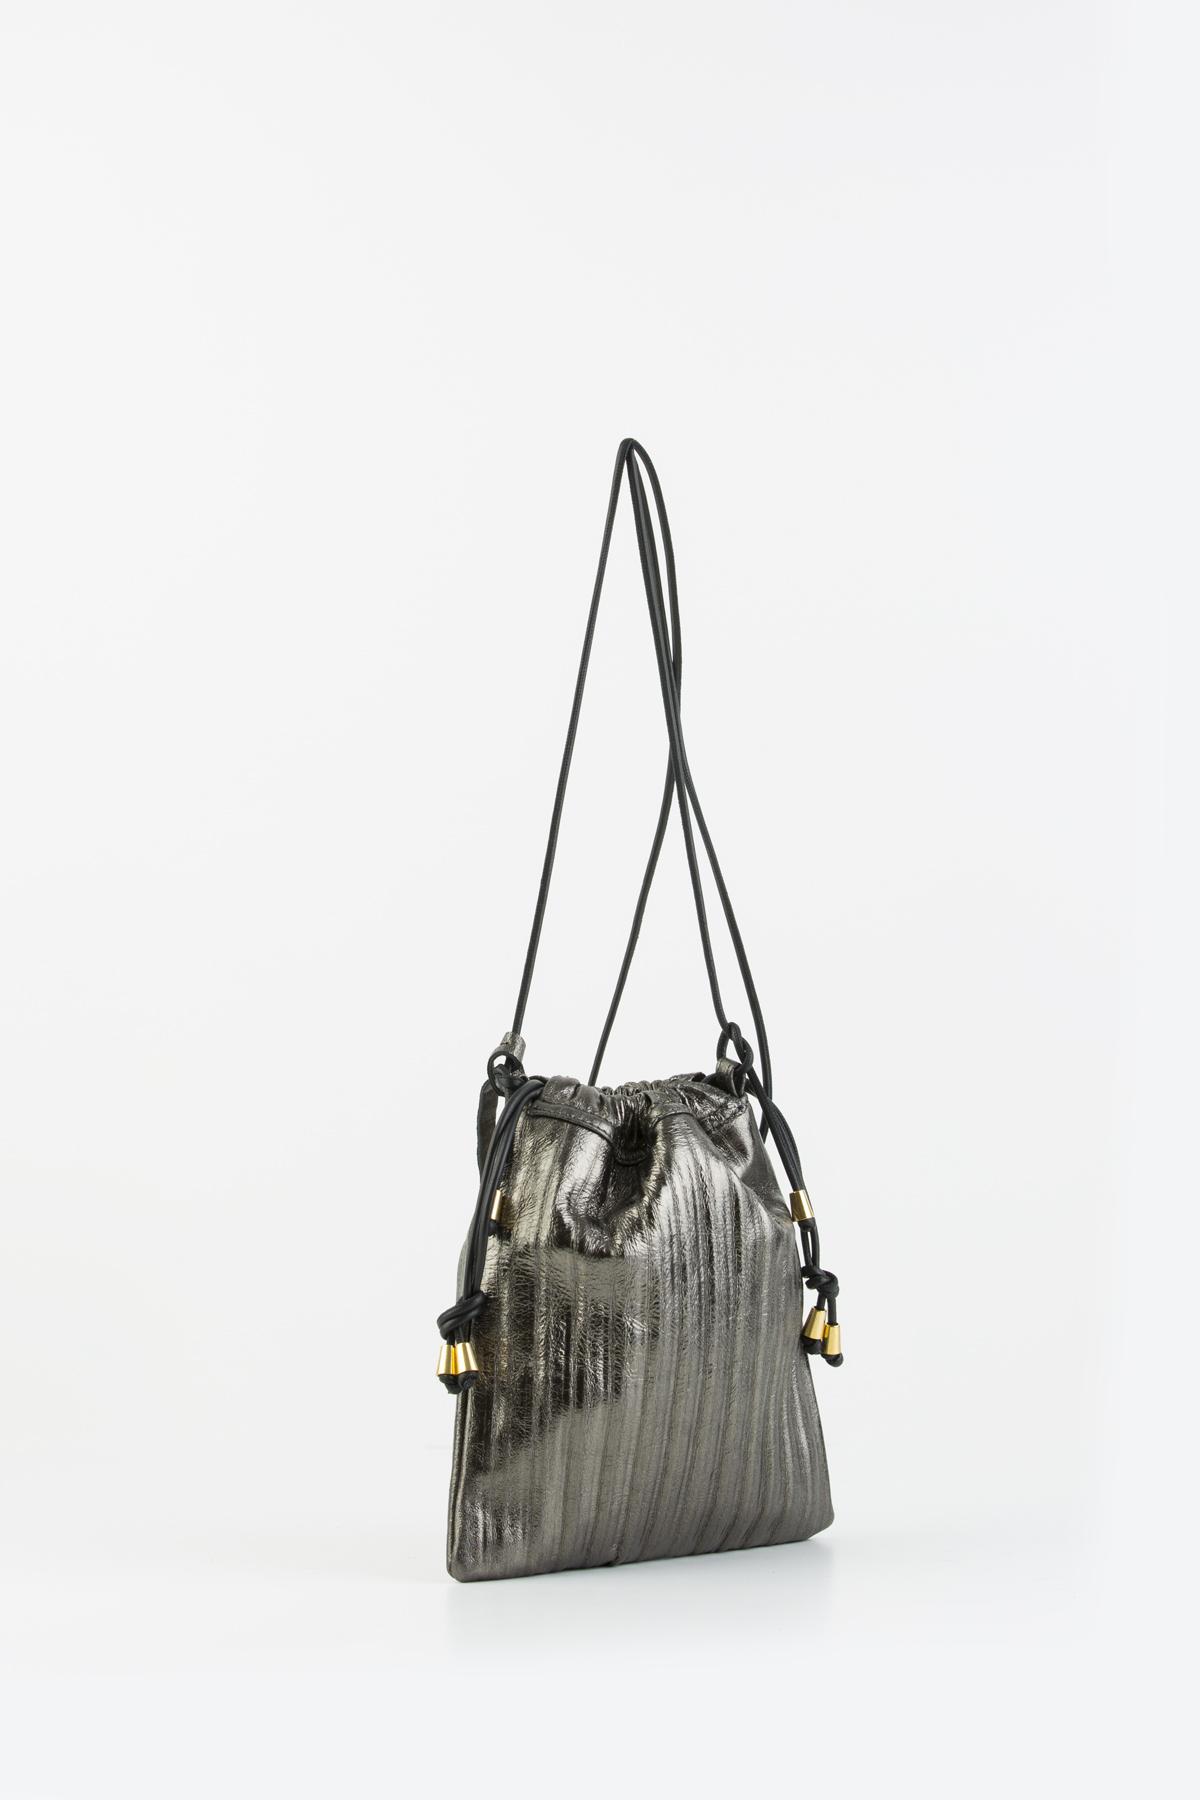 pocket-pleated-leather-charcoal-bag-anita-billardi-matchboxathens